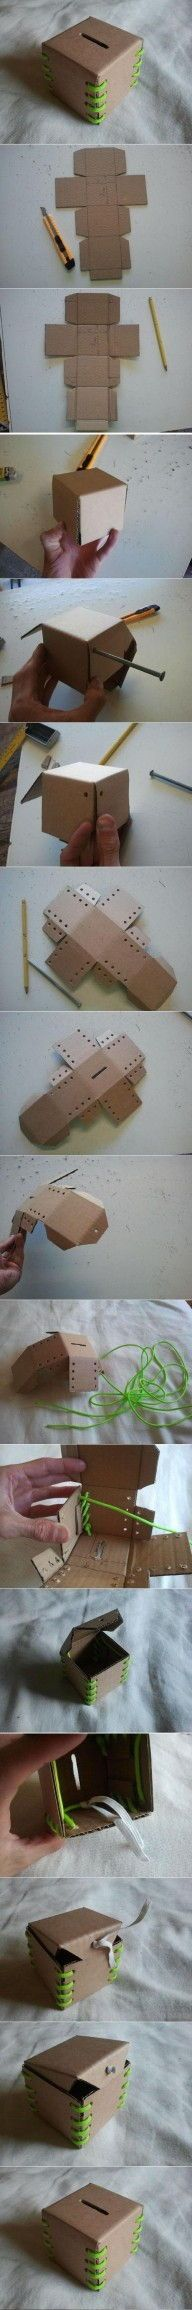 DIY Cardboard Piggy Bank DIY Projects